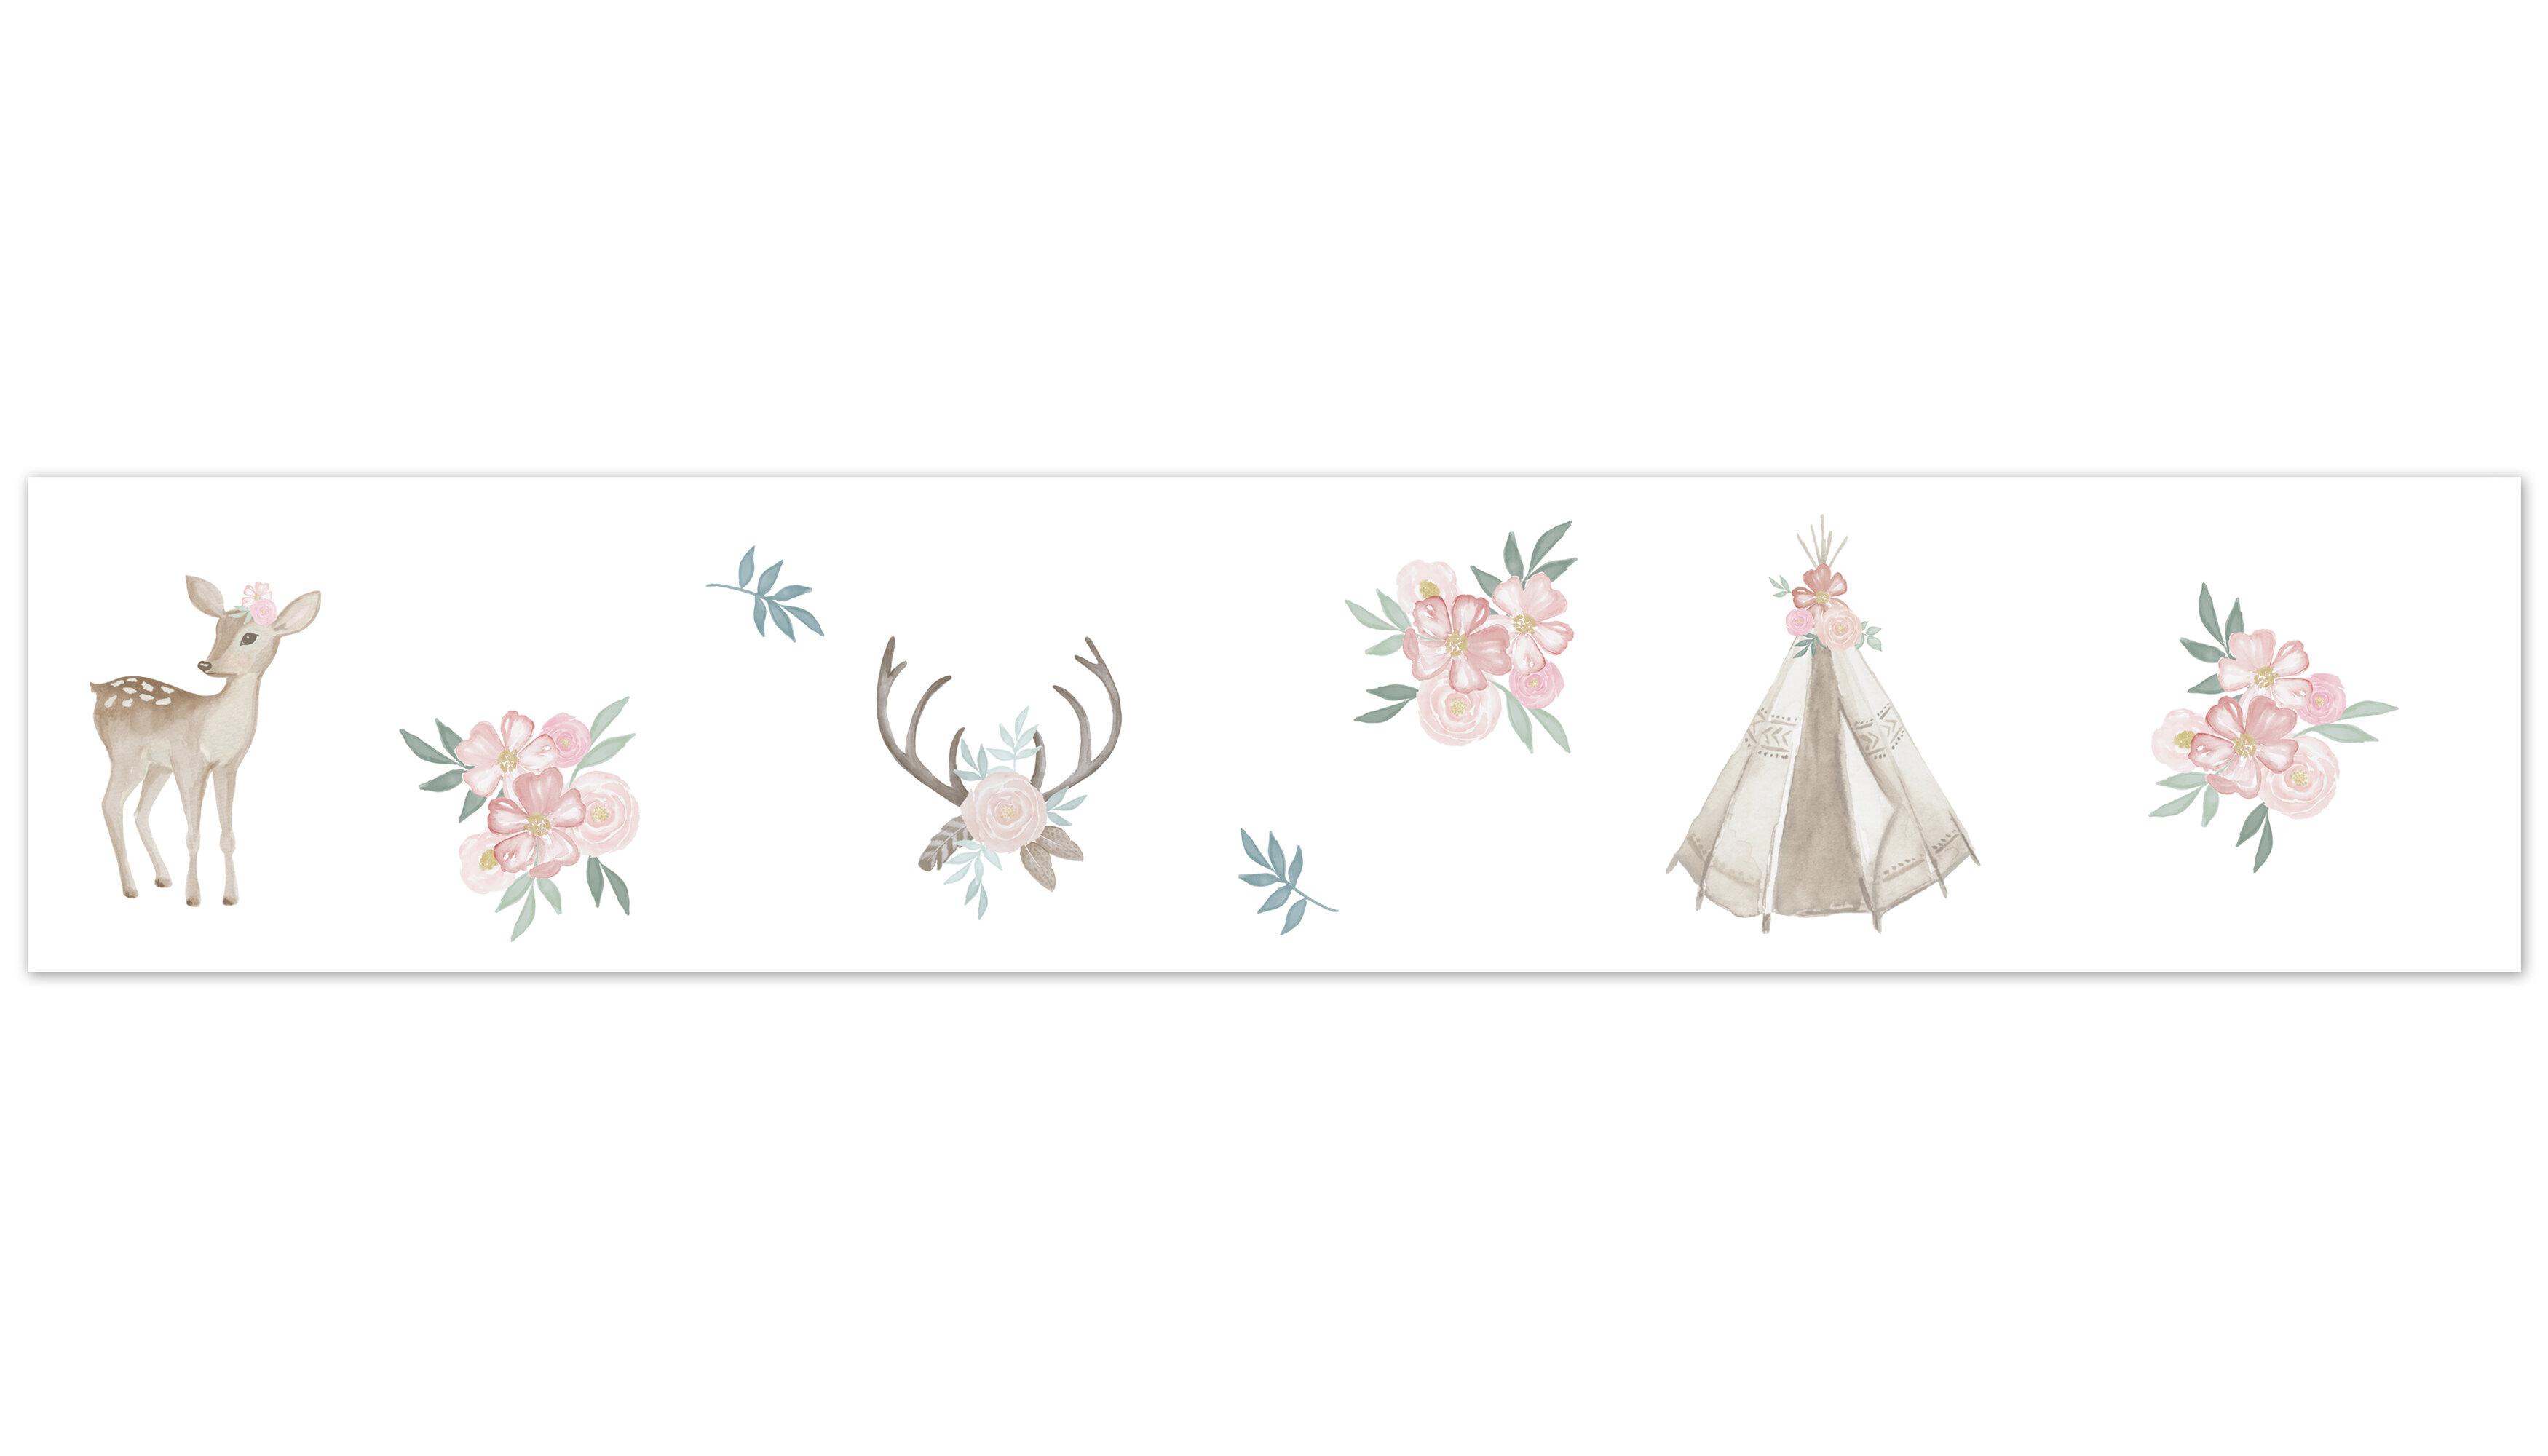 Sweet Jojo Designs Deer Floral 15 L X 6 W Smooth Wallpaper